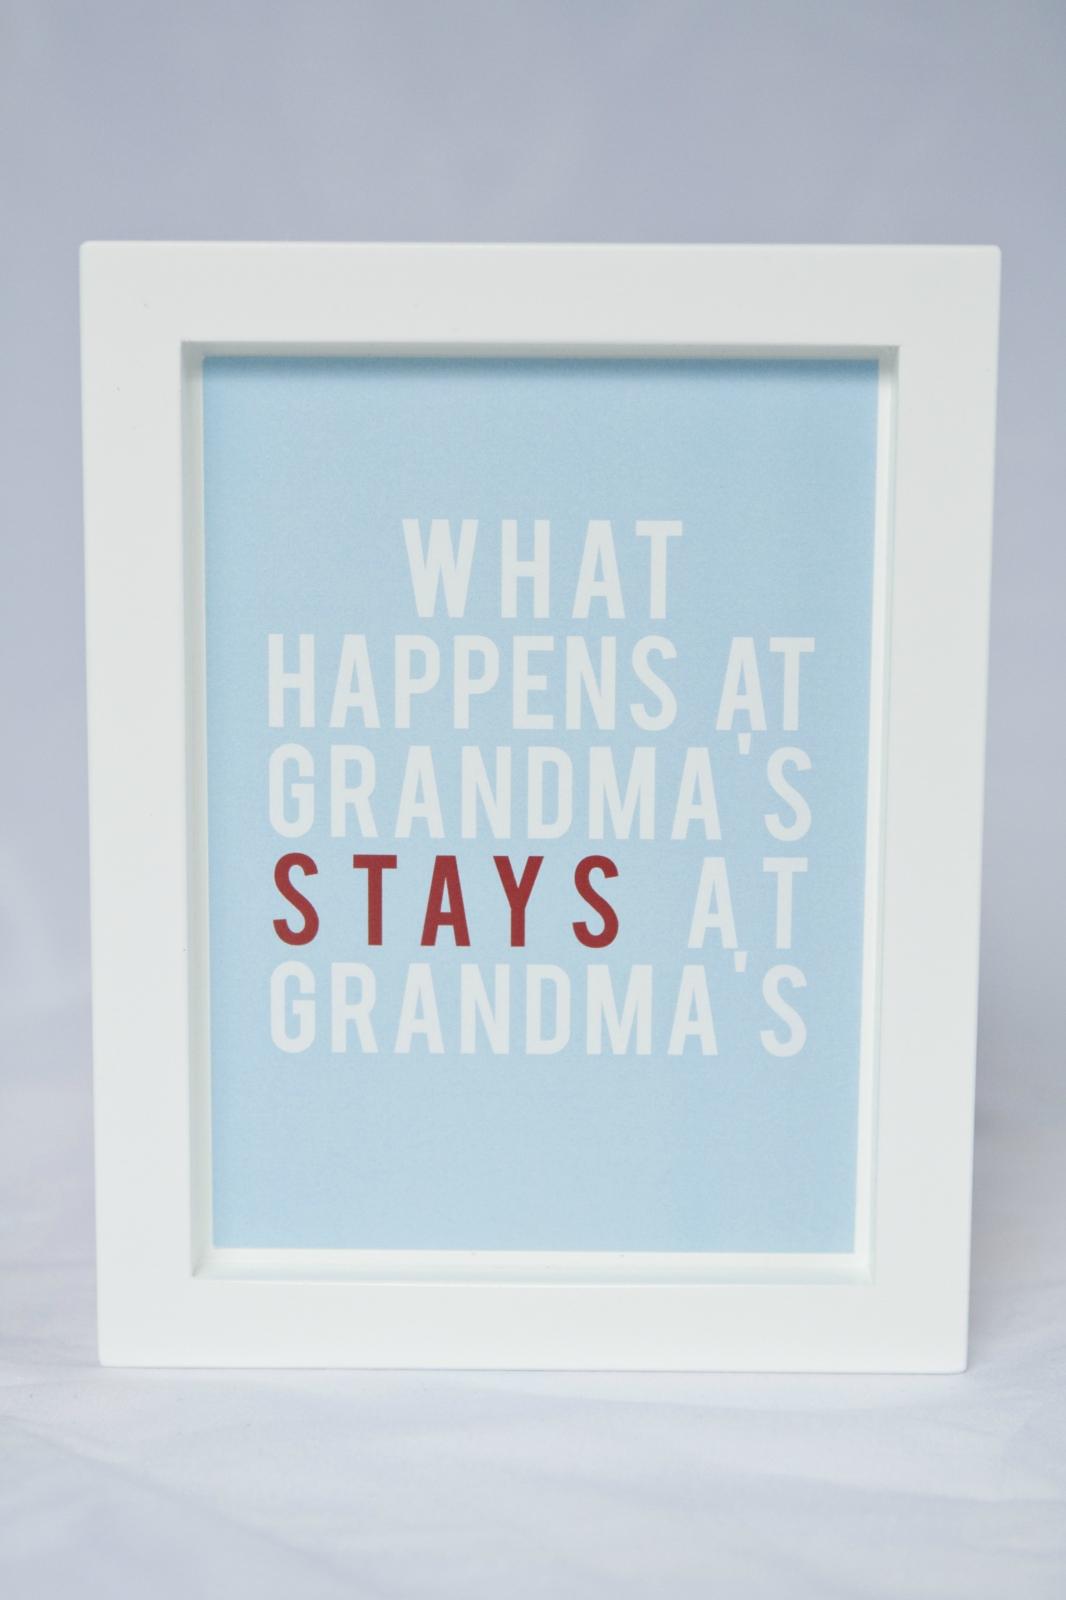 Wall Decor Framed Quotes : Framed grandma quote wall art felt